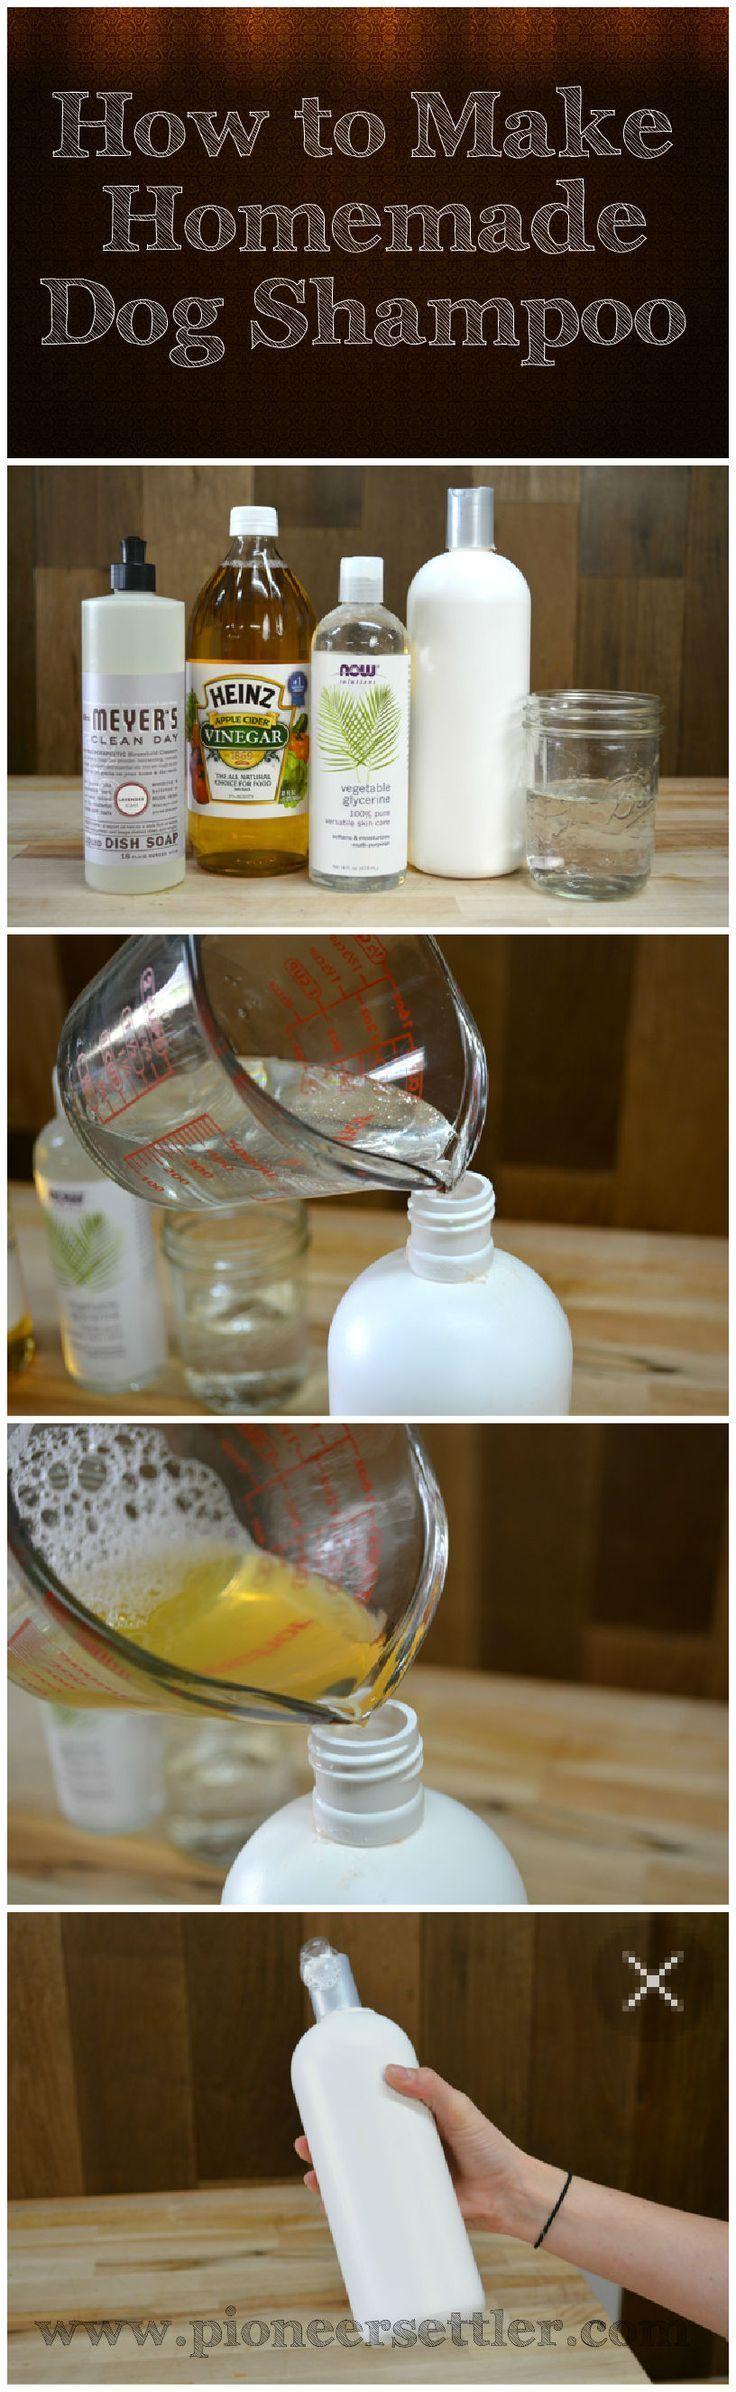 How to Make Homemade Dog Shampoo Homemade dog shampoo